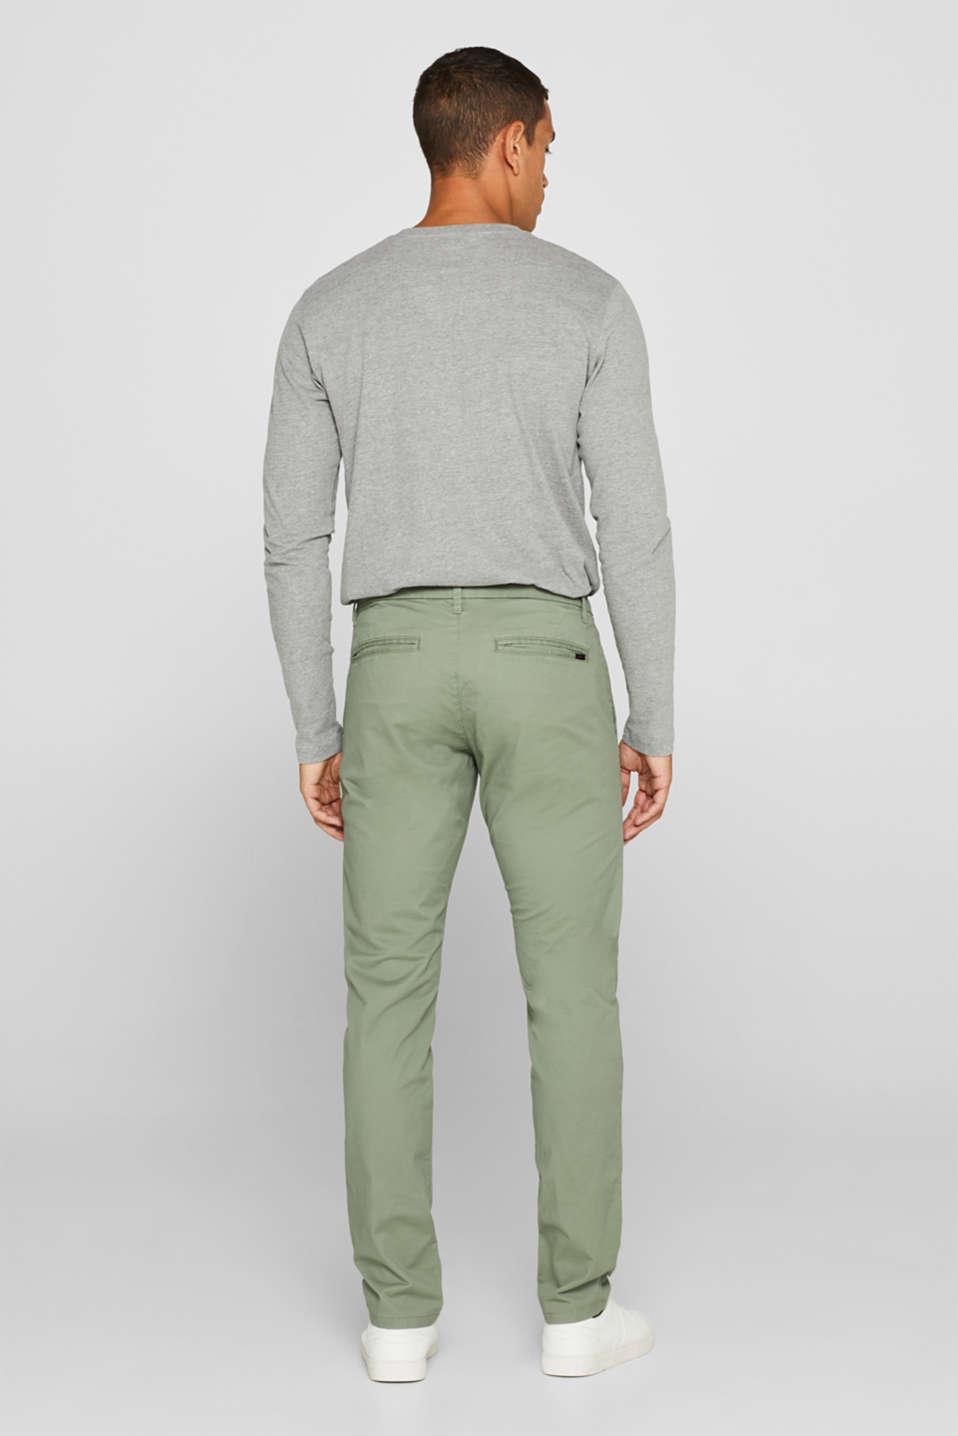 Pants woven Slim fit, LIGHT KHAKI, detail image number 2